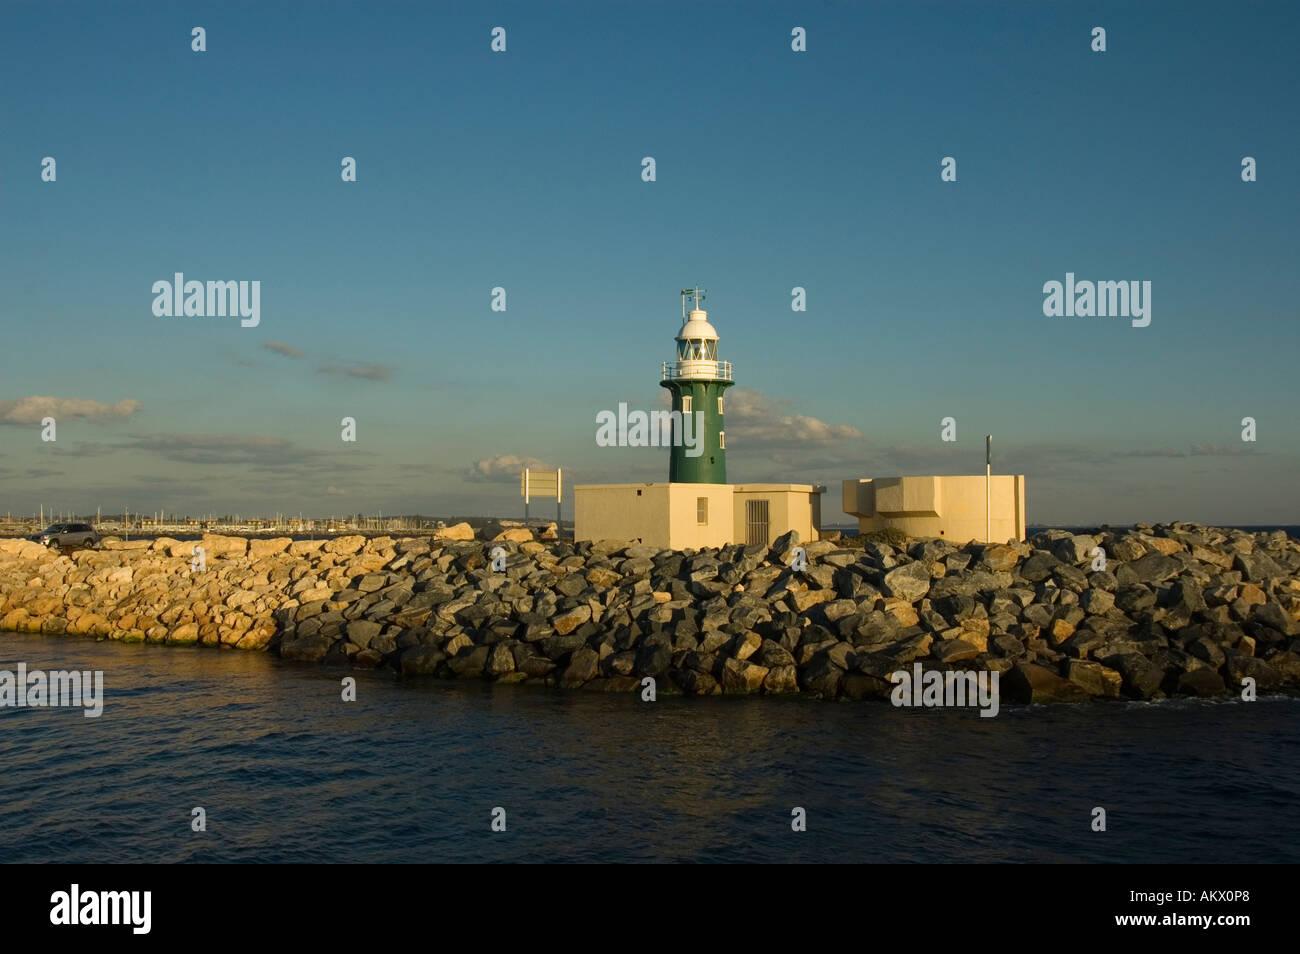 Lighthouse, horbour in Freemantle, Australia - Stock Image